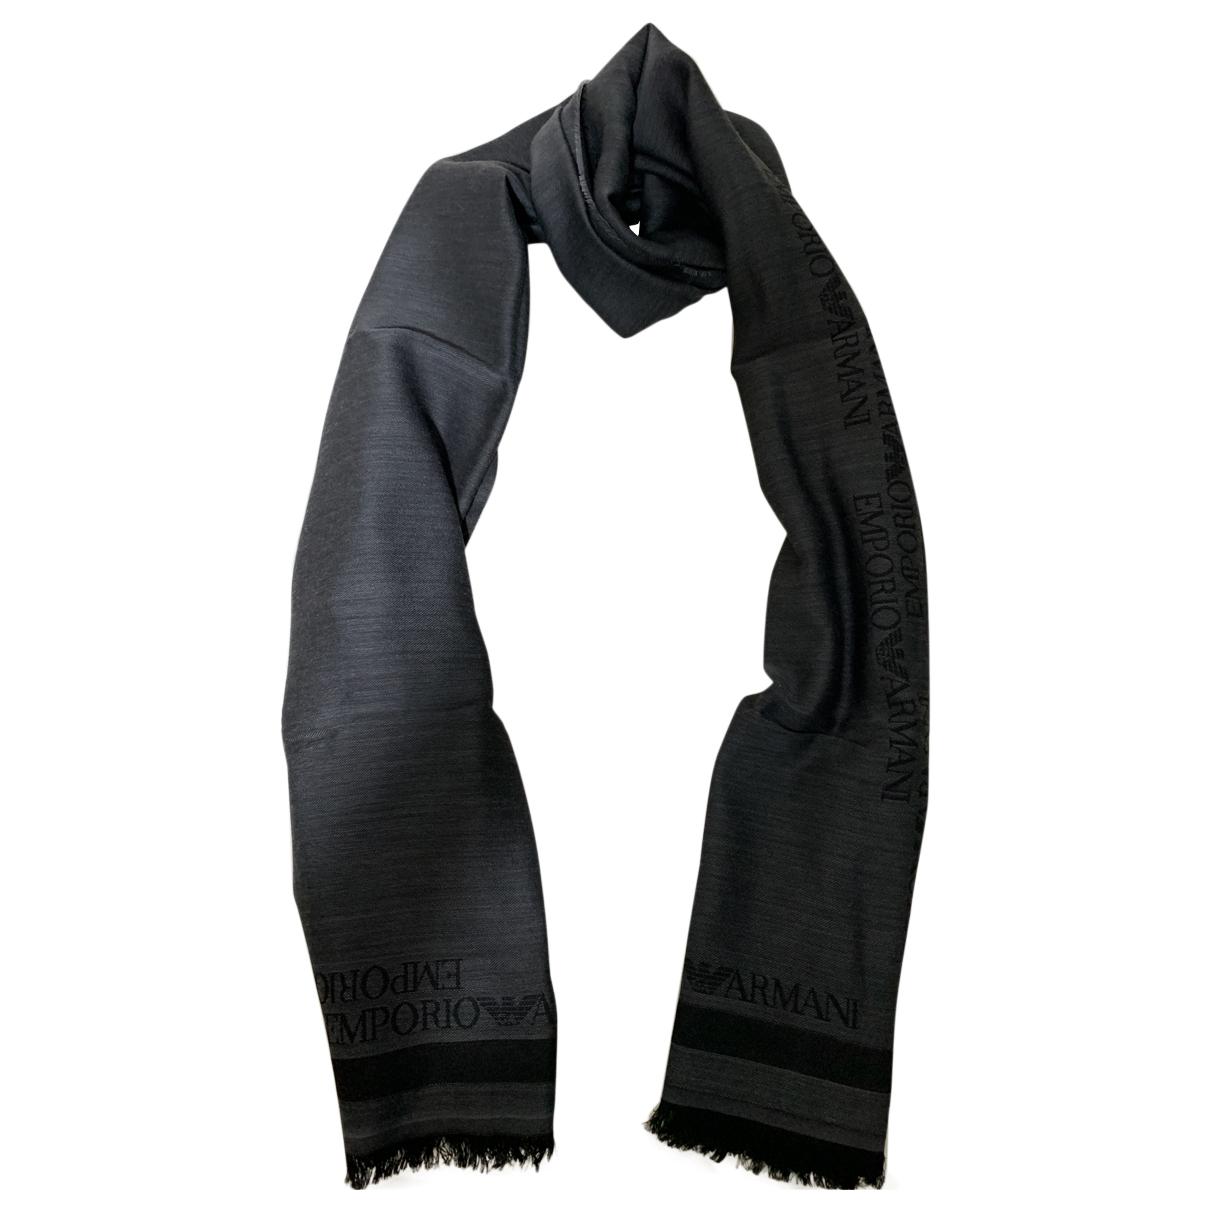 Pañuelo / bufanda Emporio Armani